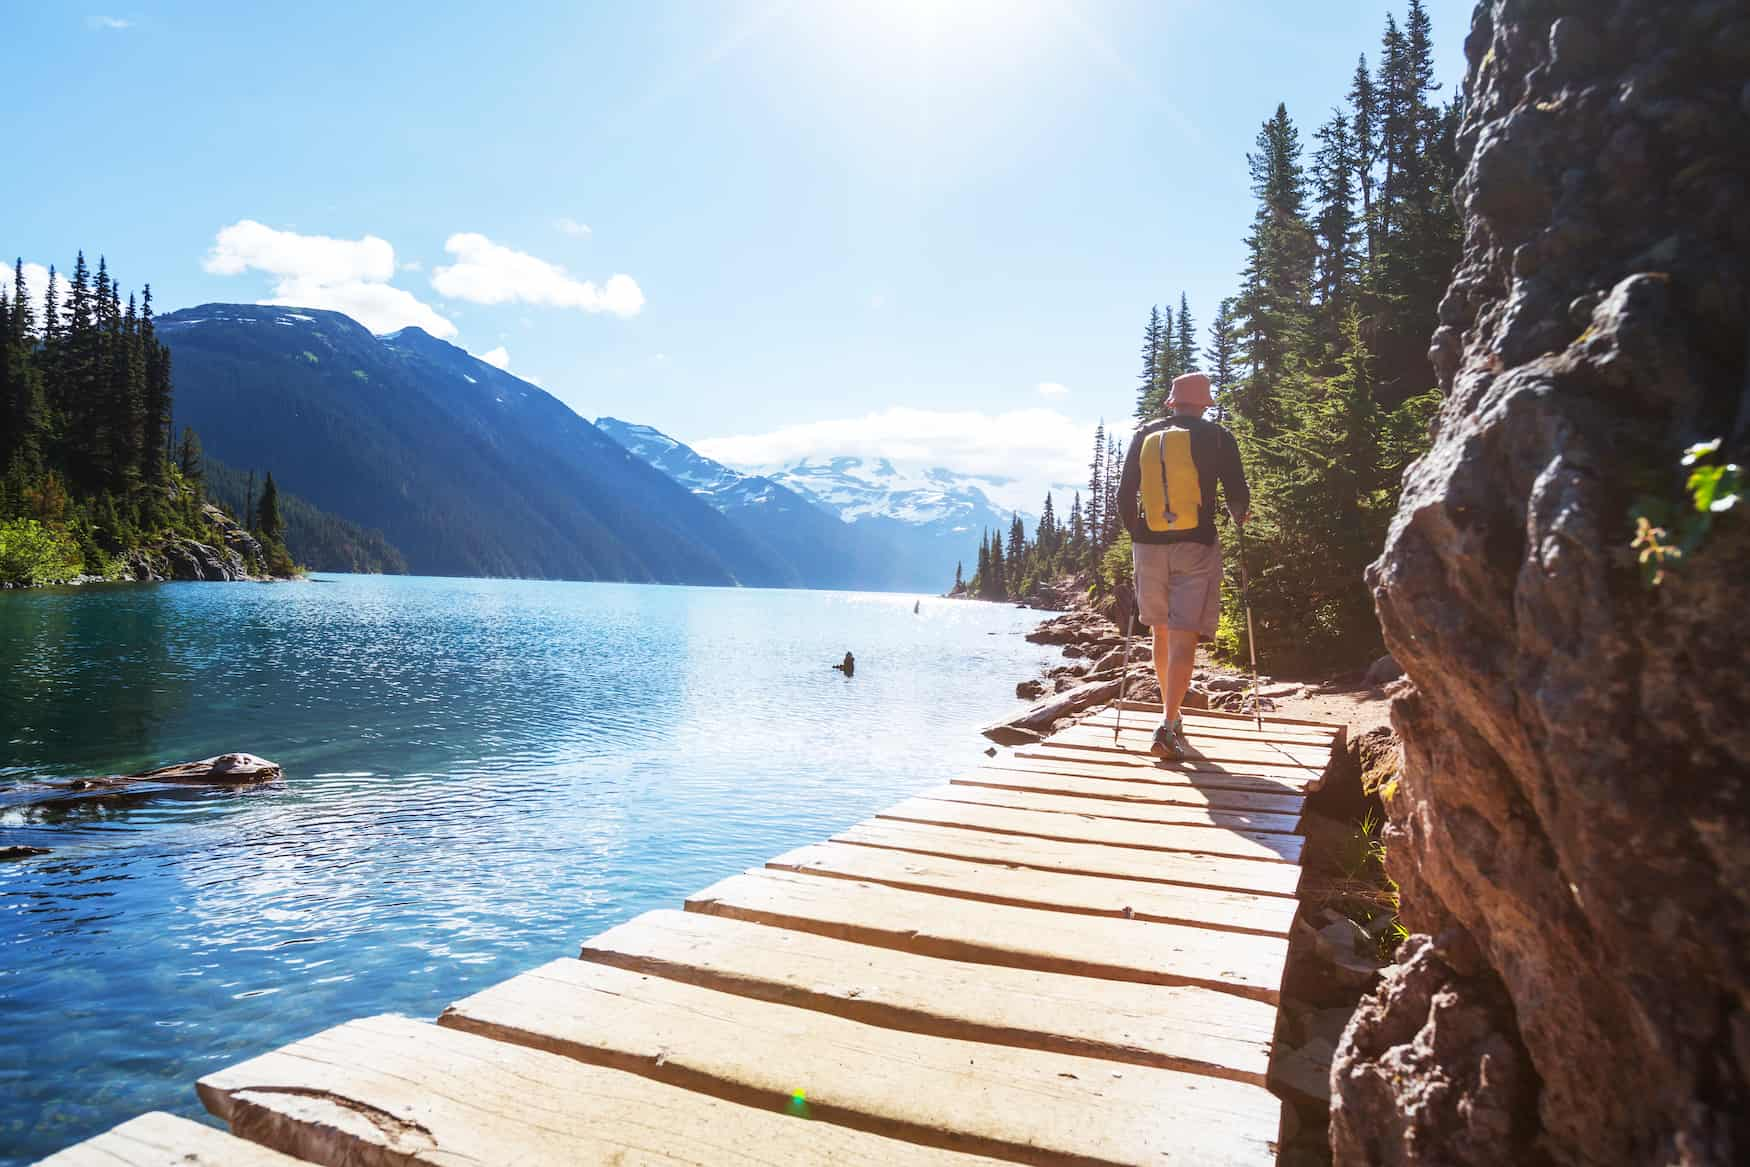 Wandern am Garibaldi Lake, Garibaldi Provincial Park, British Columbia